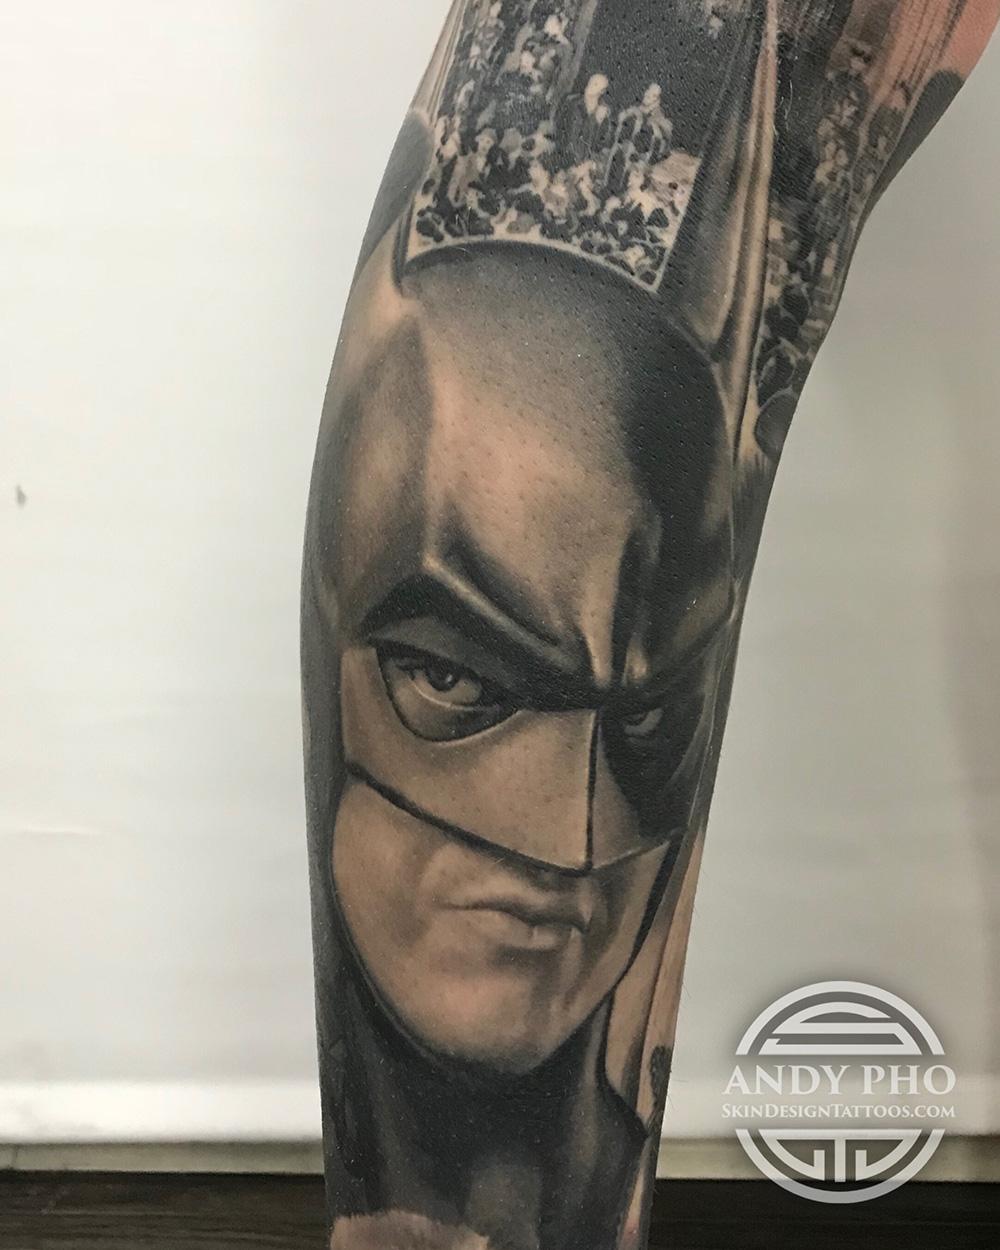 Andy Pho Batman tattoo.JPG